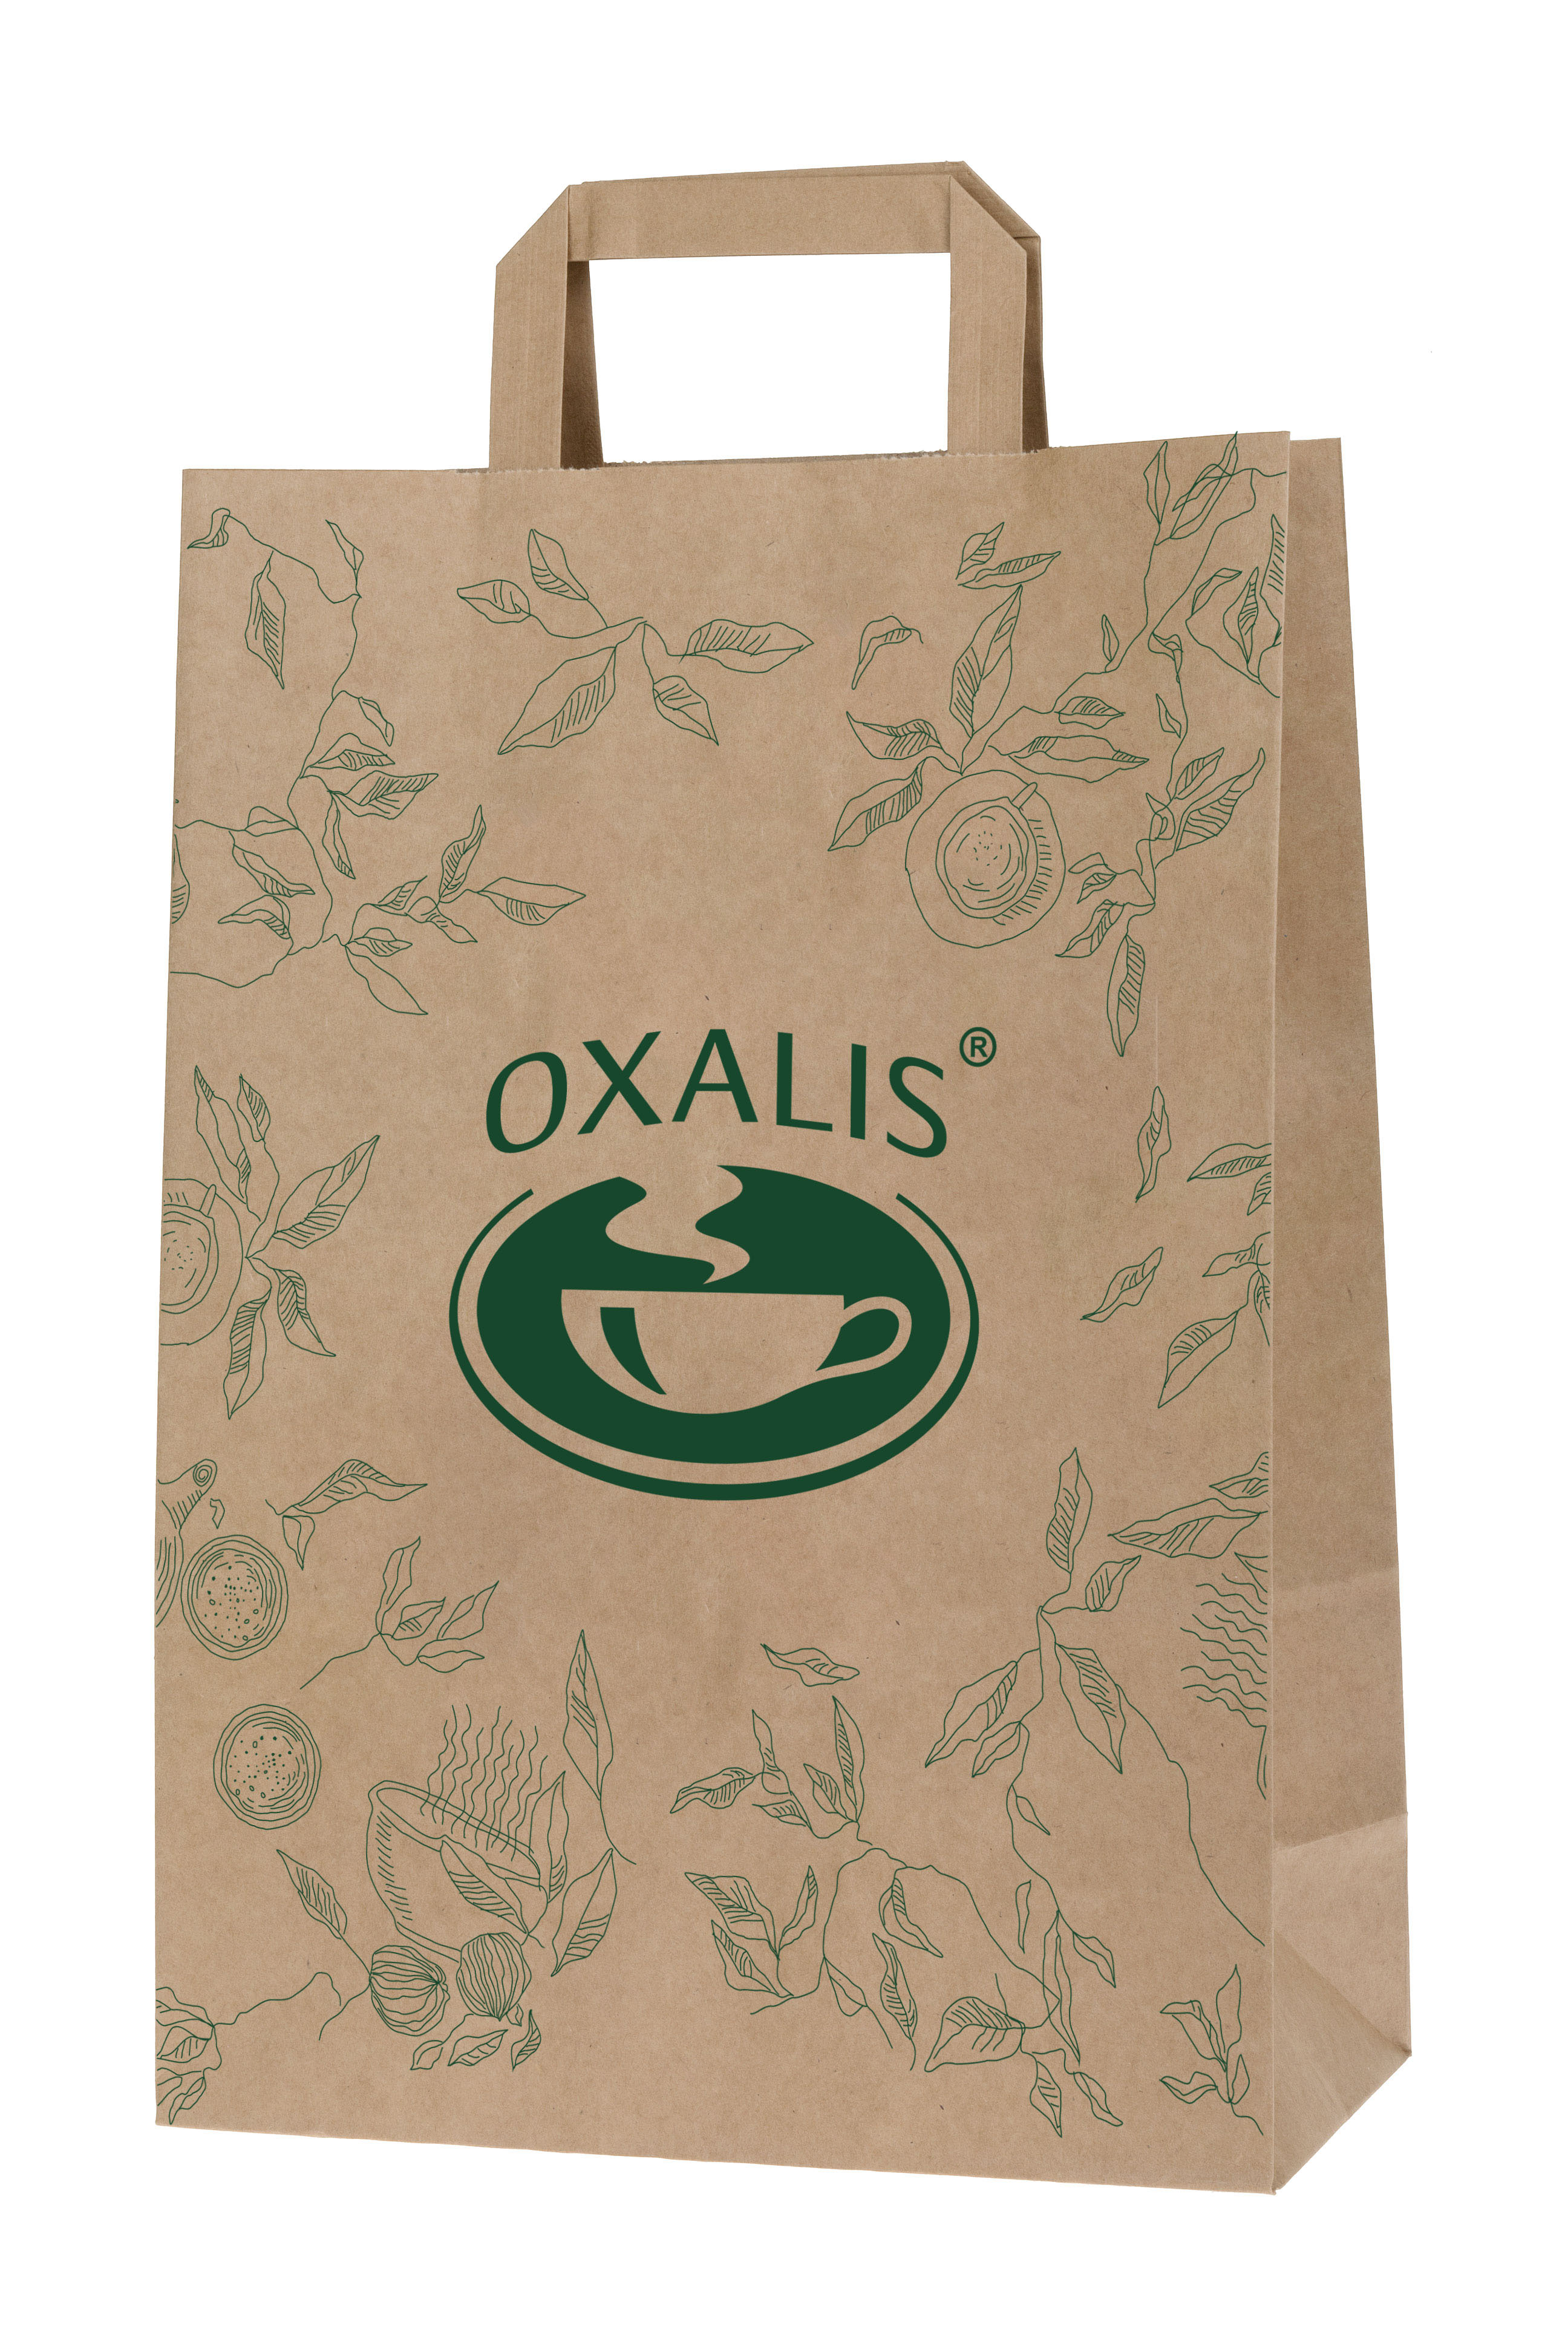 Oxalis Paper Shopping Bag - small